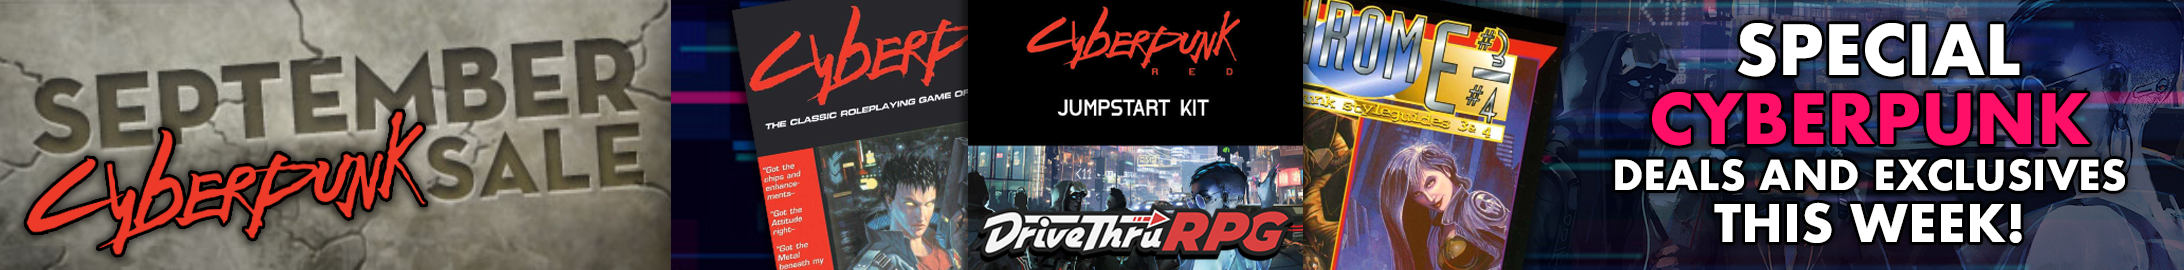 Terrific deals on Cyberpunk, all editions!